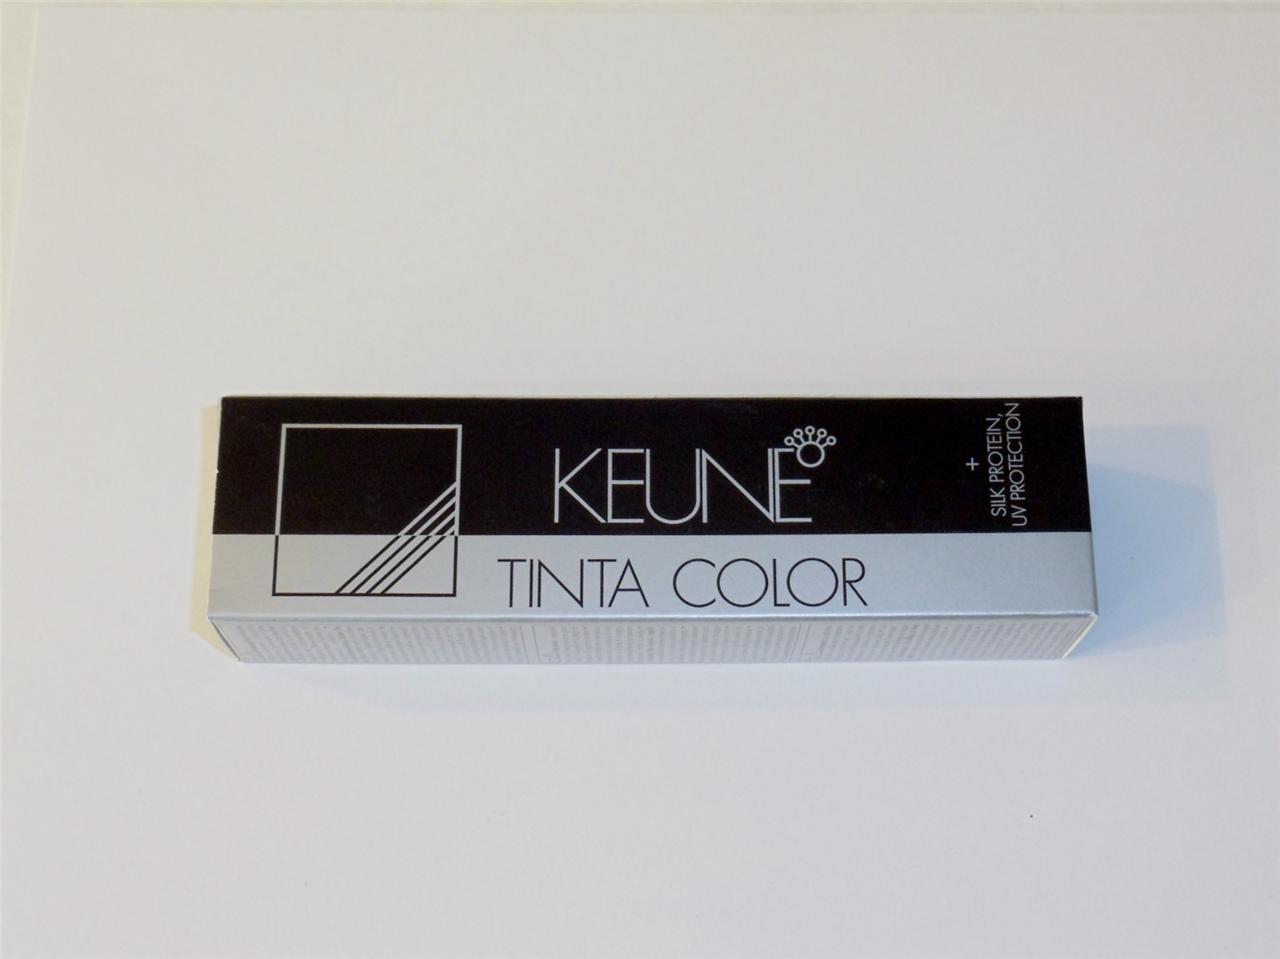 Keune Tinta Permanent Hair Color Level 8.32-Light Beige Blonde